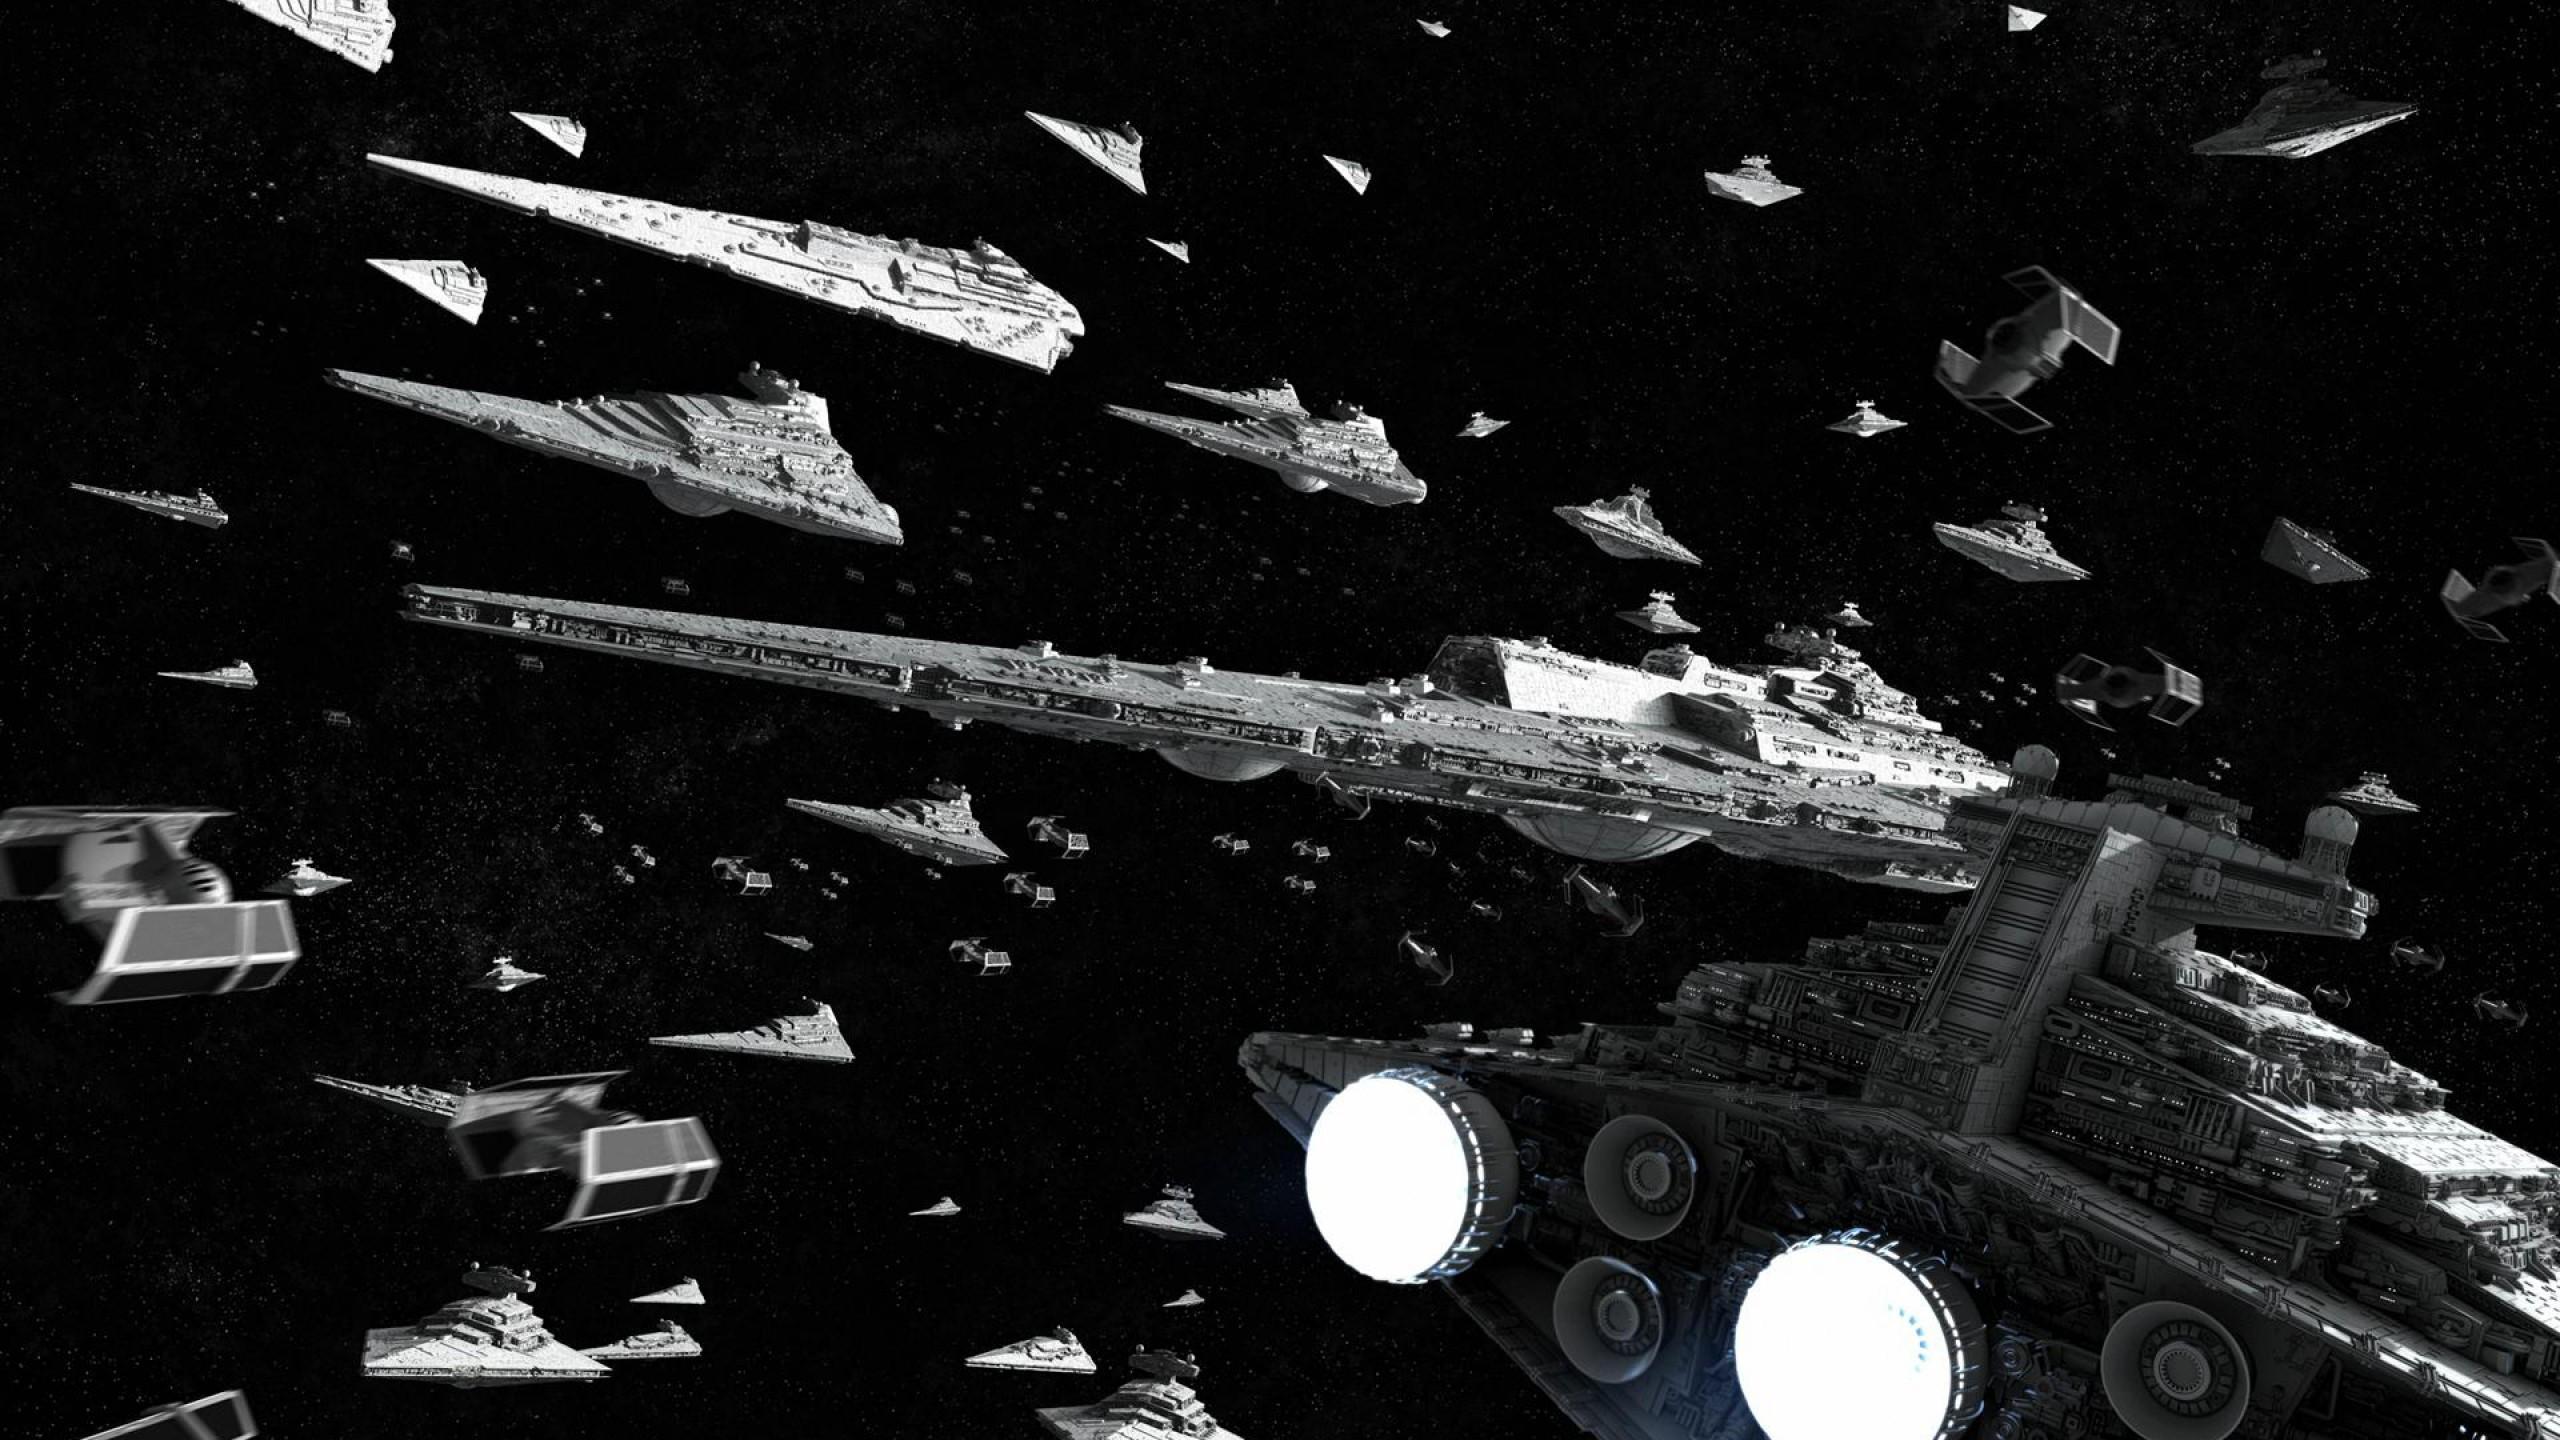 star-wars-star-destroyer-wallpaper-2.jpg